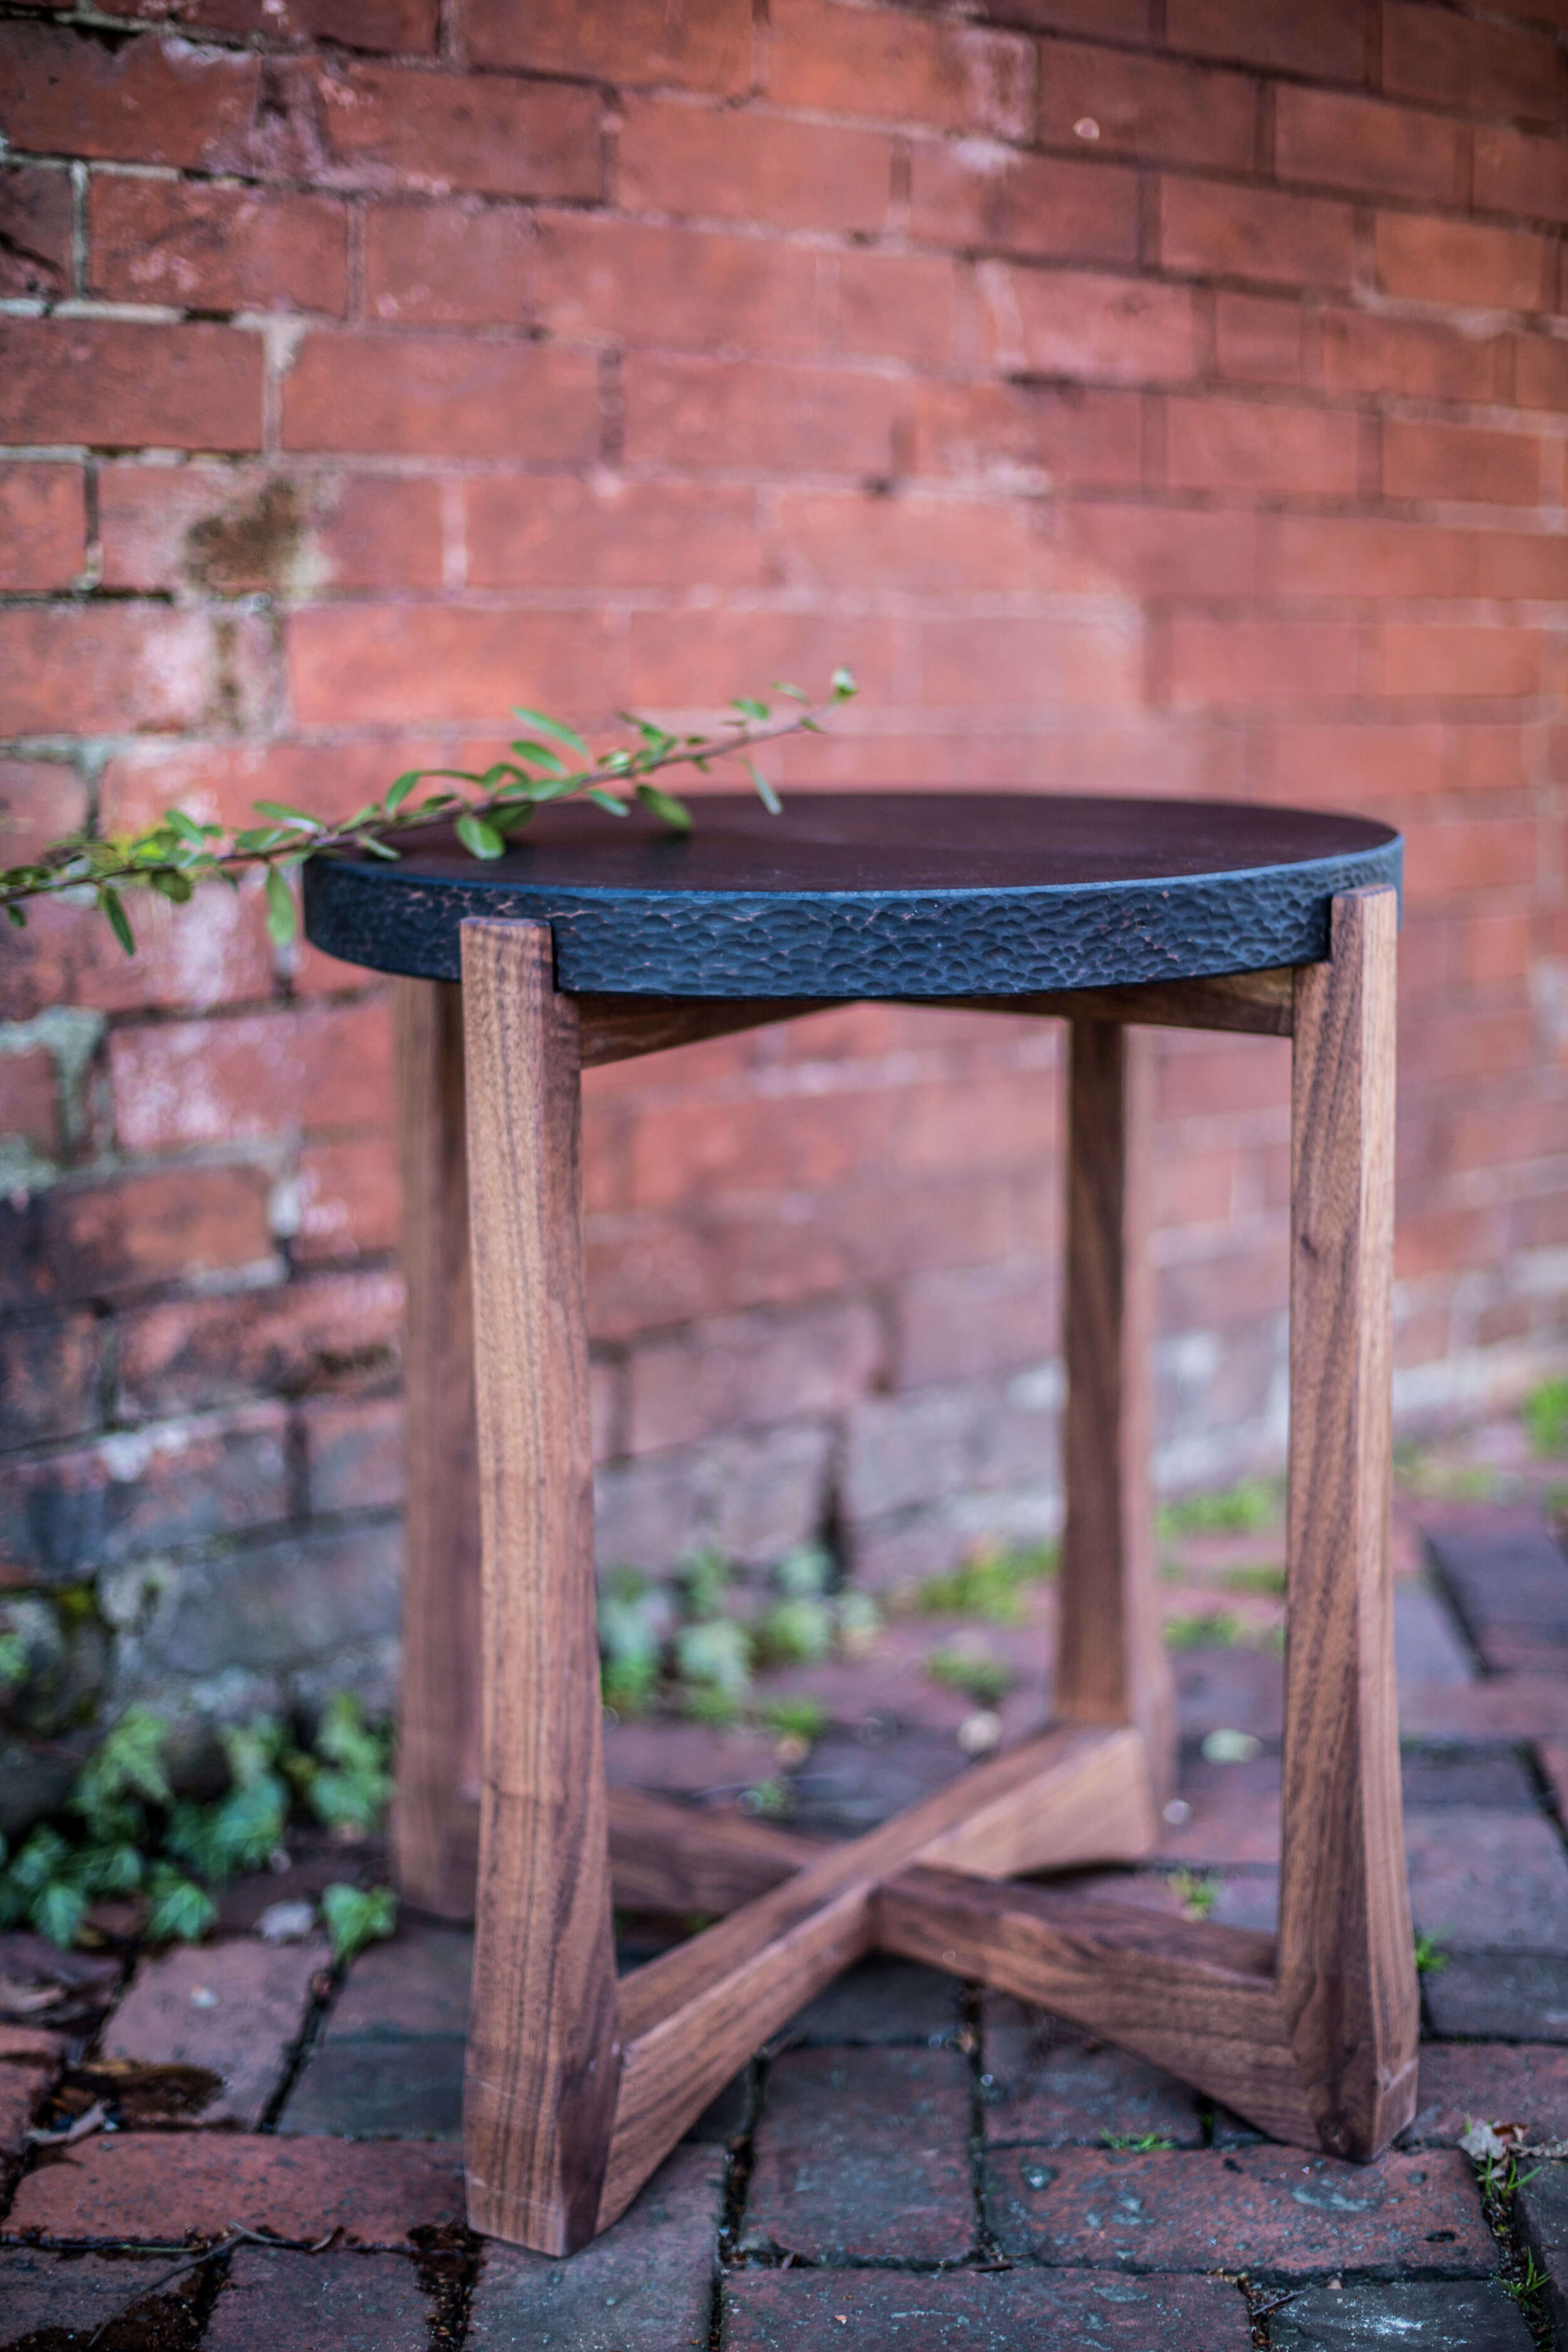 Alicia_Dietz_Modern_Concrete_Furniture_Carved_Wood_End_Table_Sofa_Table_Richmond_VA_2